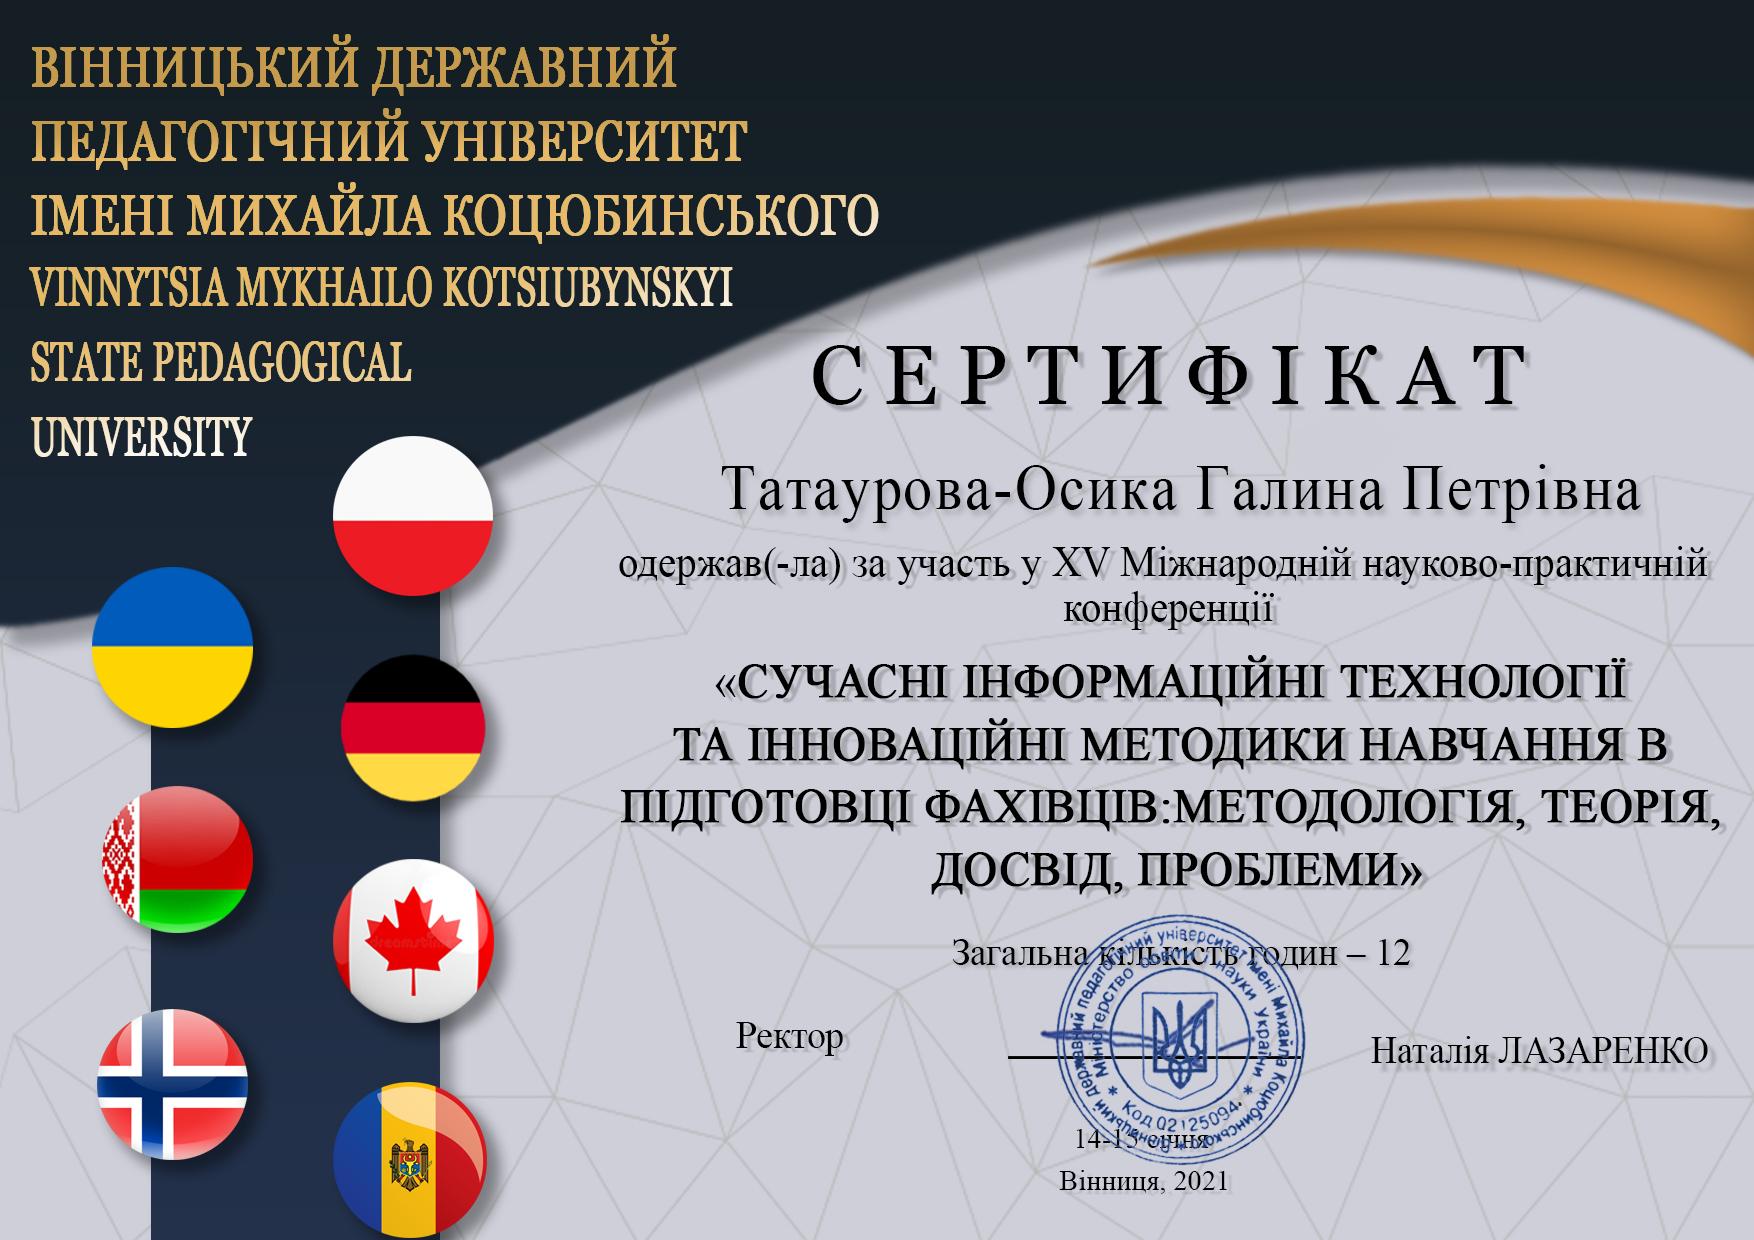 Татаурова-Осика Галина Петрівна